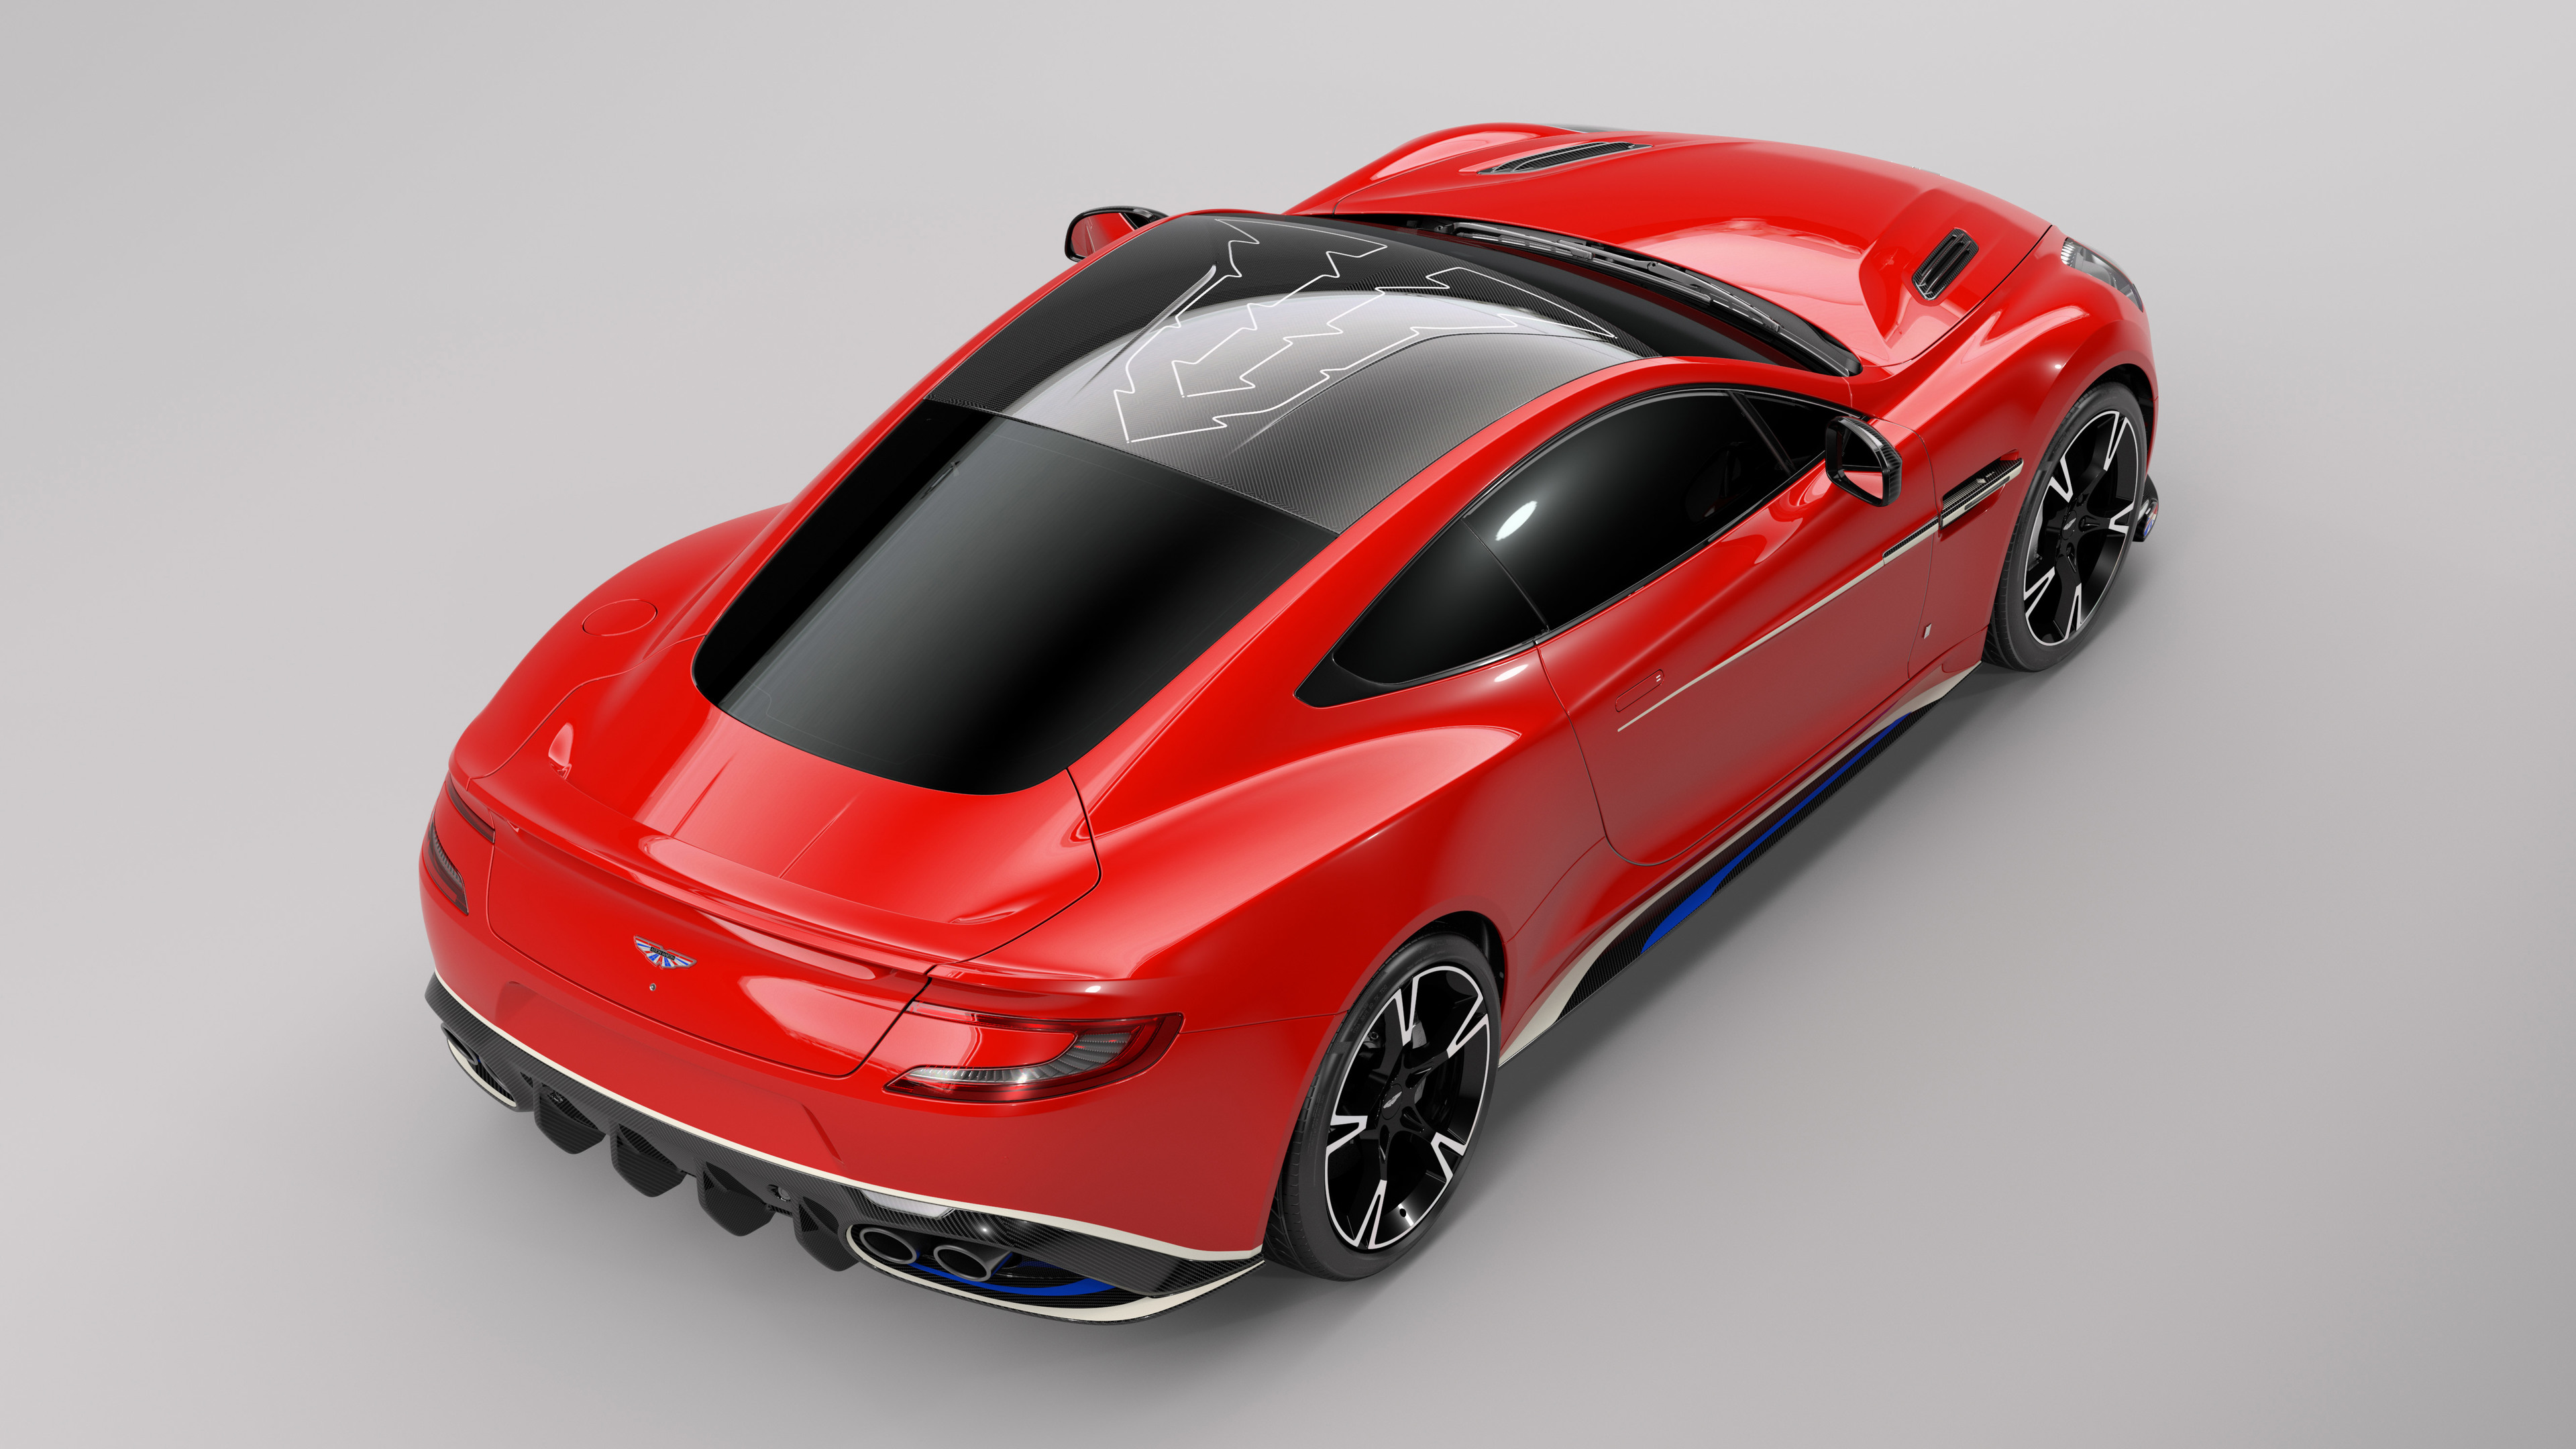 aston martin vanquish s red arrows edition rear 1539105166 - Aston Martin Vanquish S Red Arrows Edition Rear - hd-wallpapers, cars wallpapers, aston martin wallpapers, 5k wallpapers, 4k-wallpapers, 2017 cars wallpapers